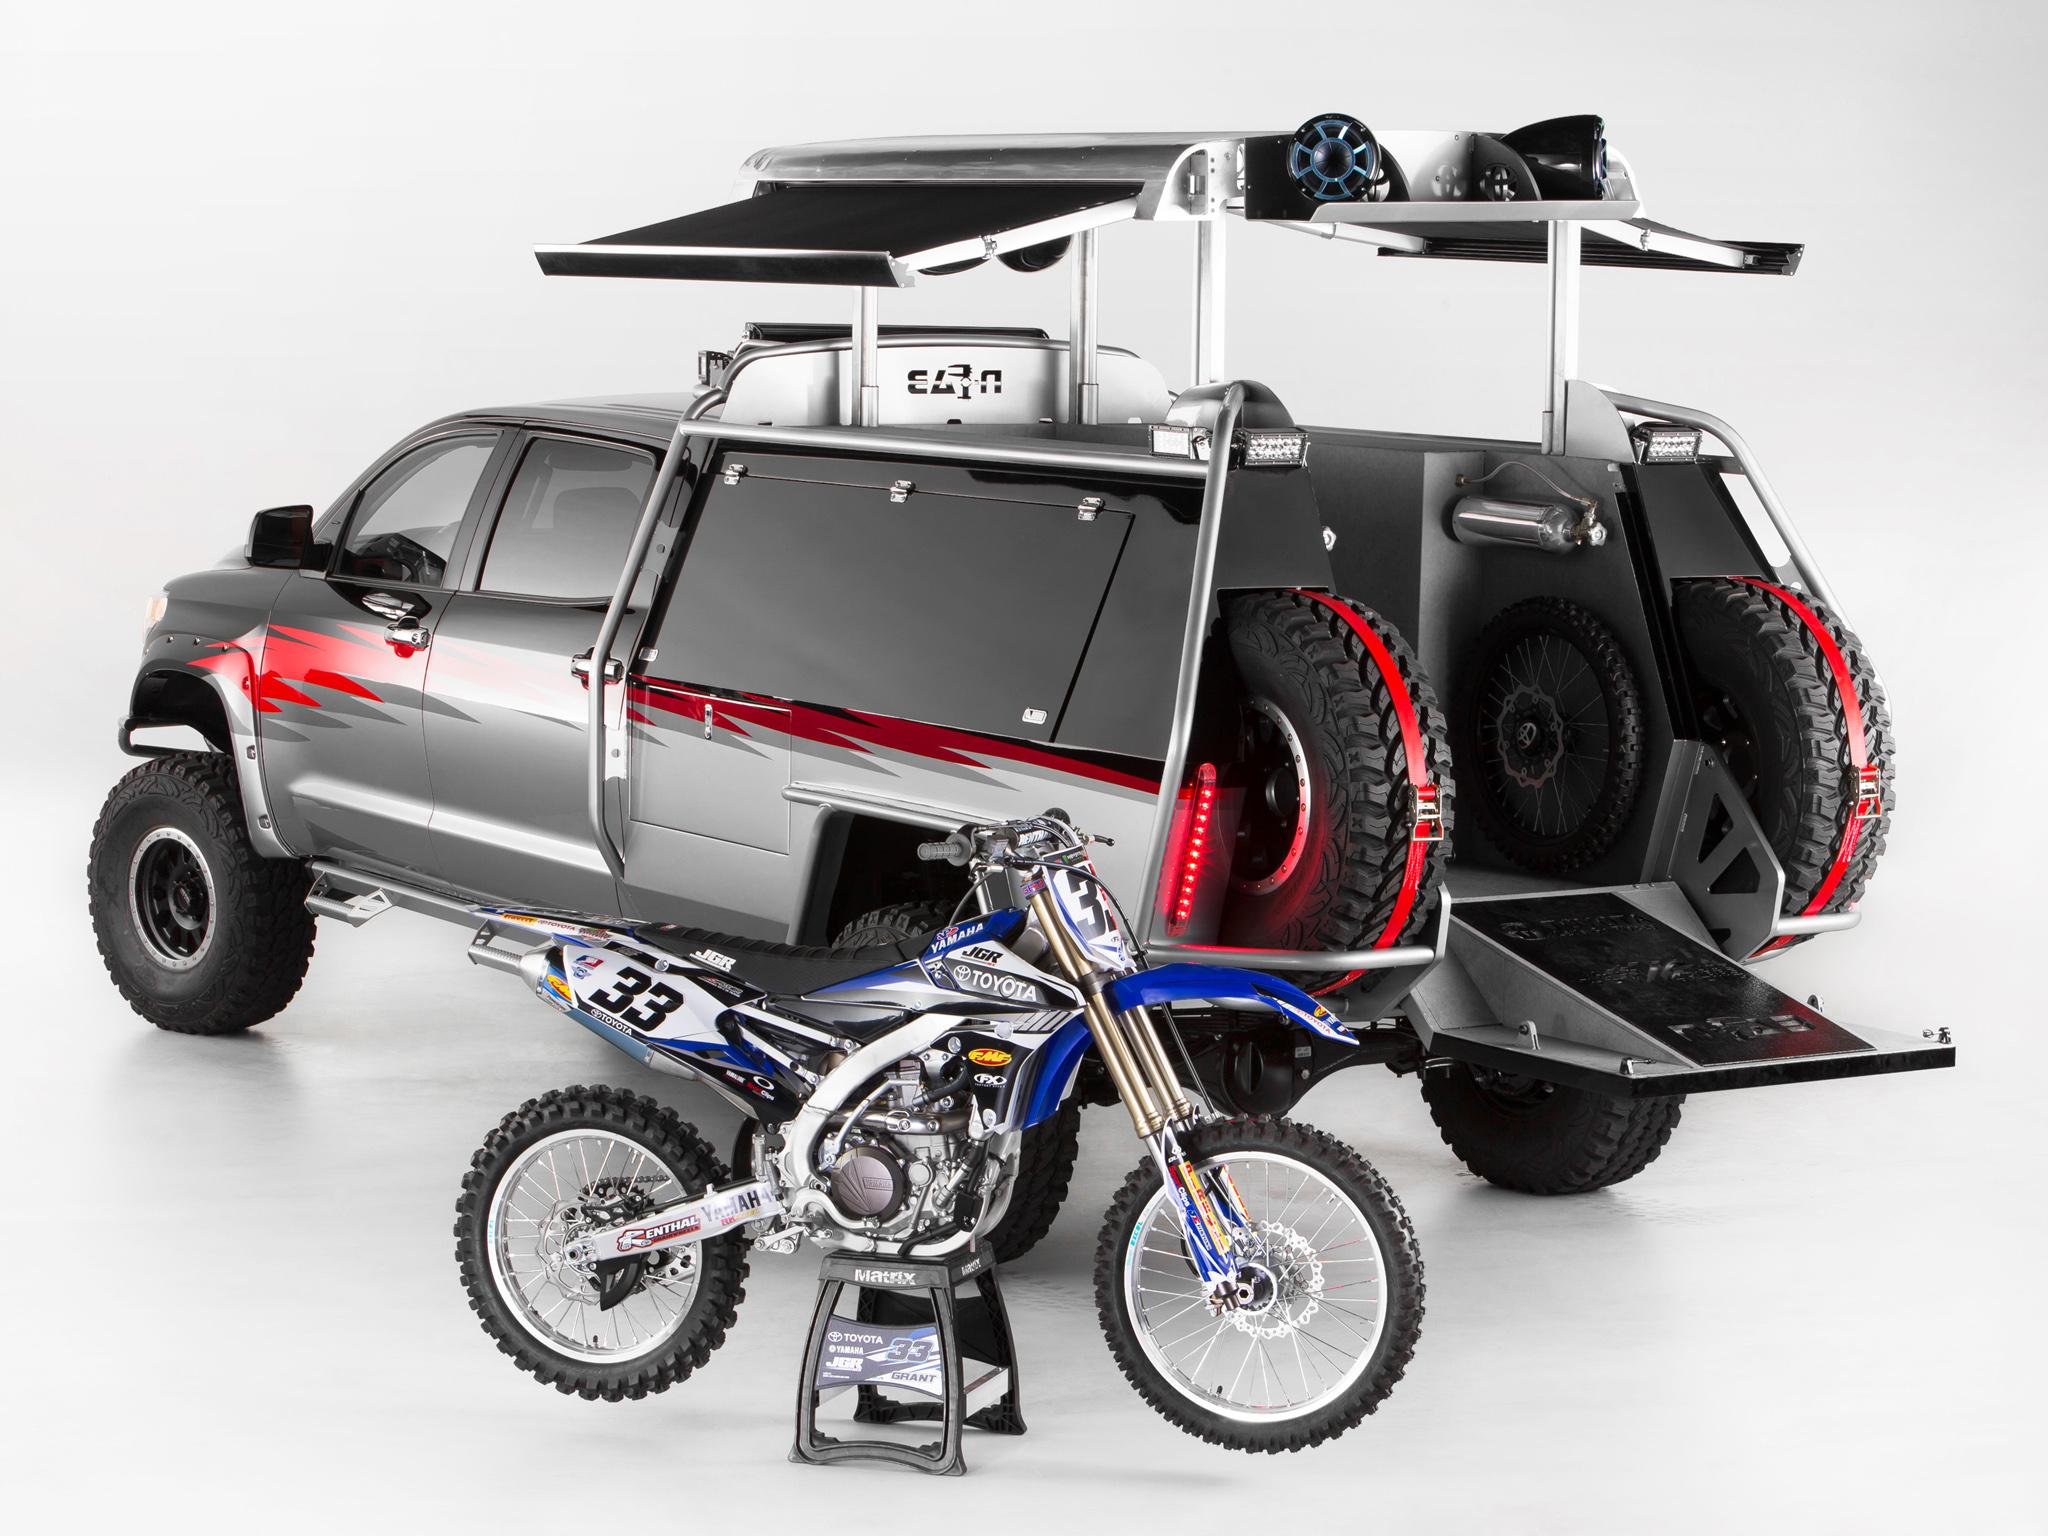 2013 Toyota Tundra Lets Go Moto Offroad 4x4 Dirtbike